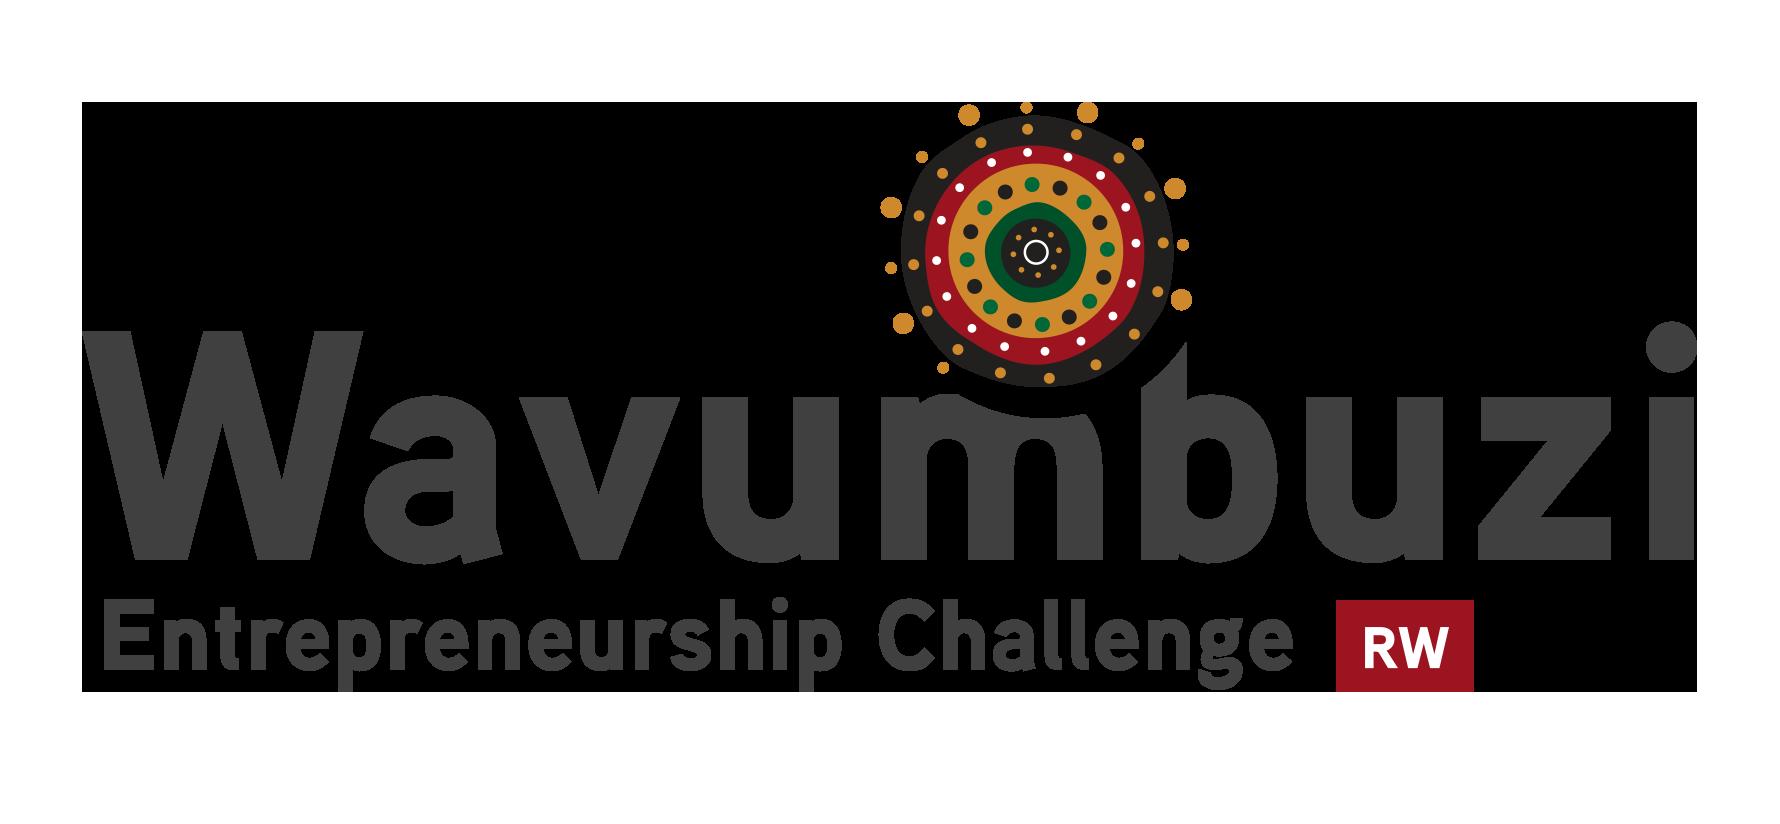 Wavumbuzi Entrepreneurship Challenge | Rwanda